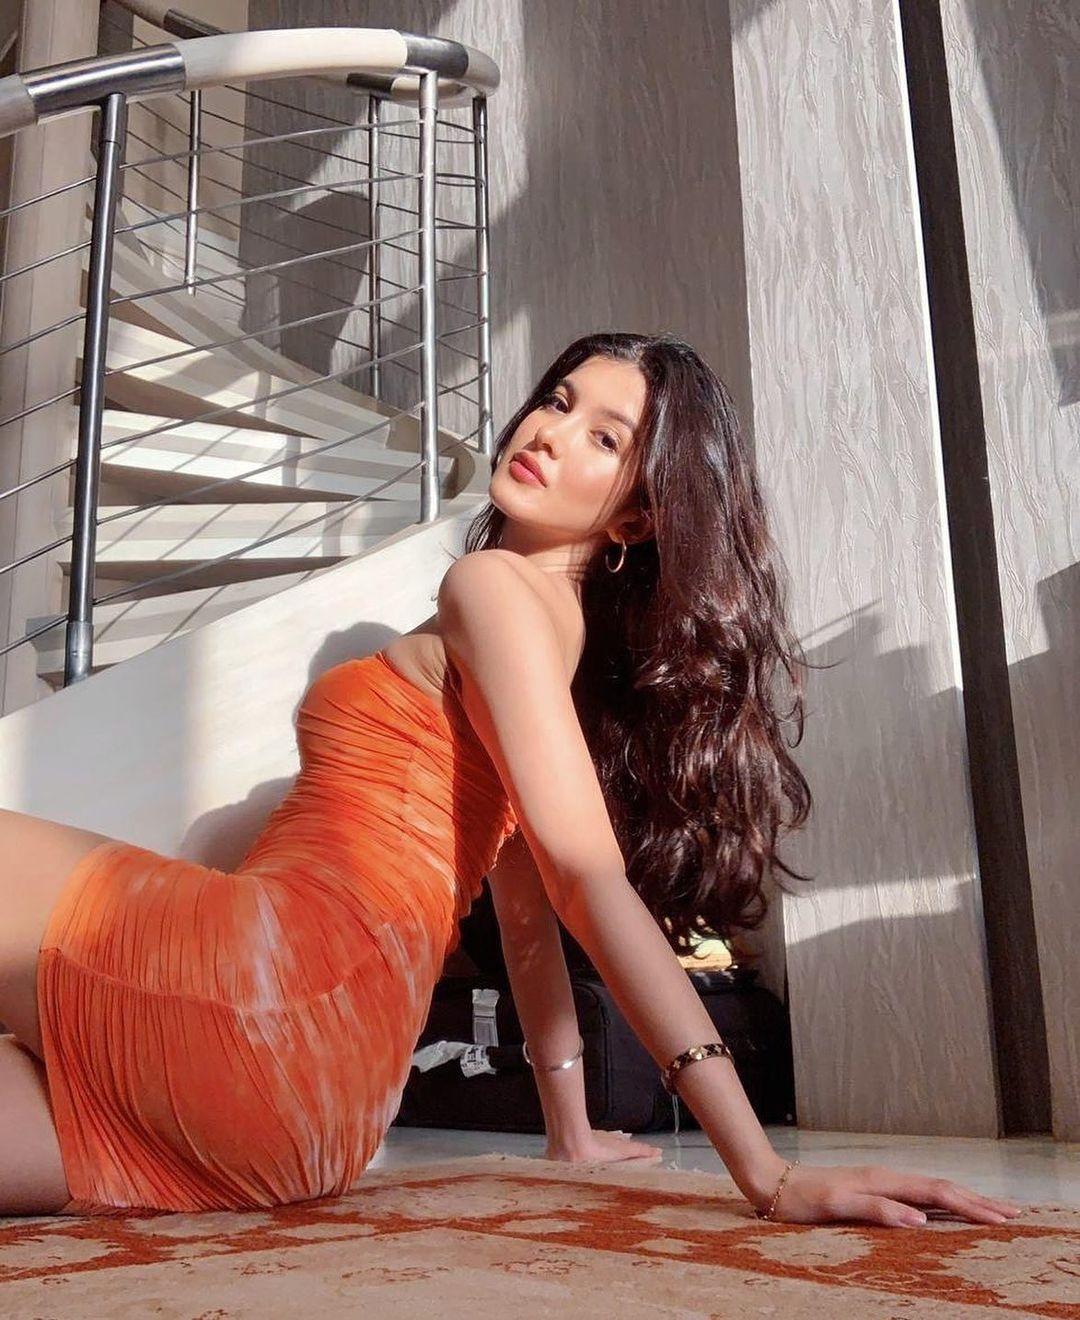 Shanaya Kapoor looks hot in red